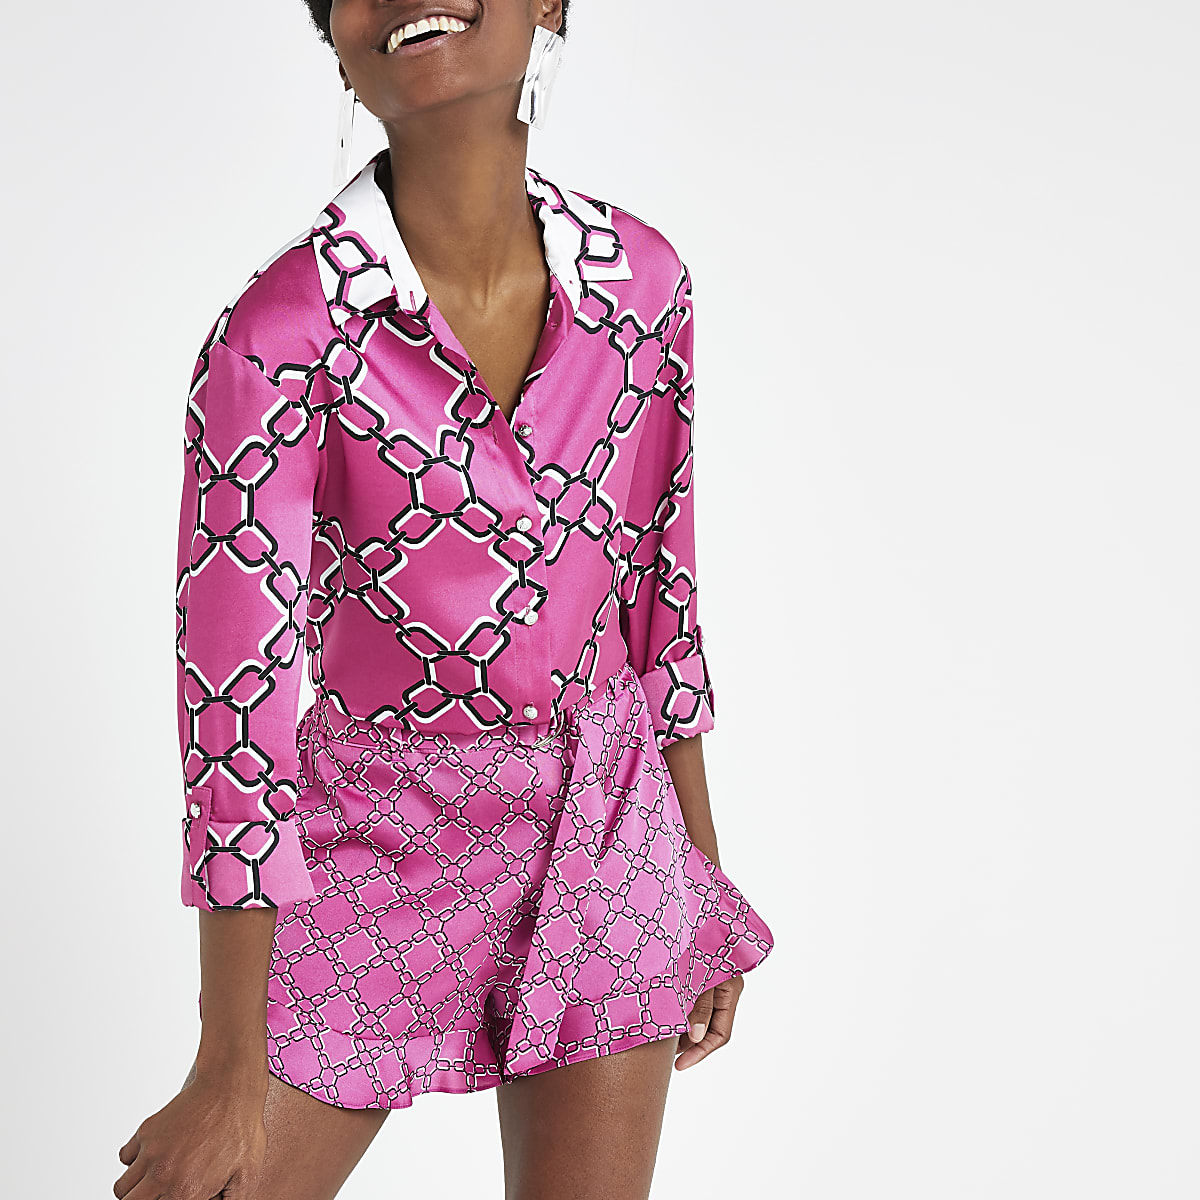 Pink chain print frill shorts